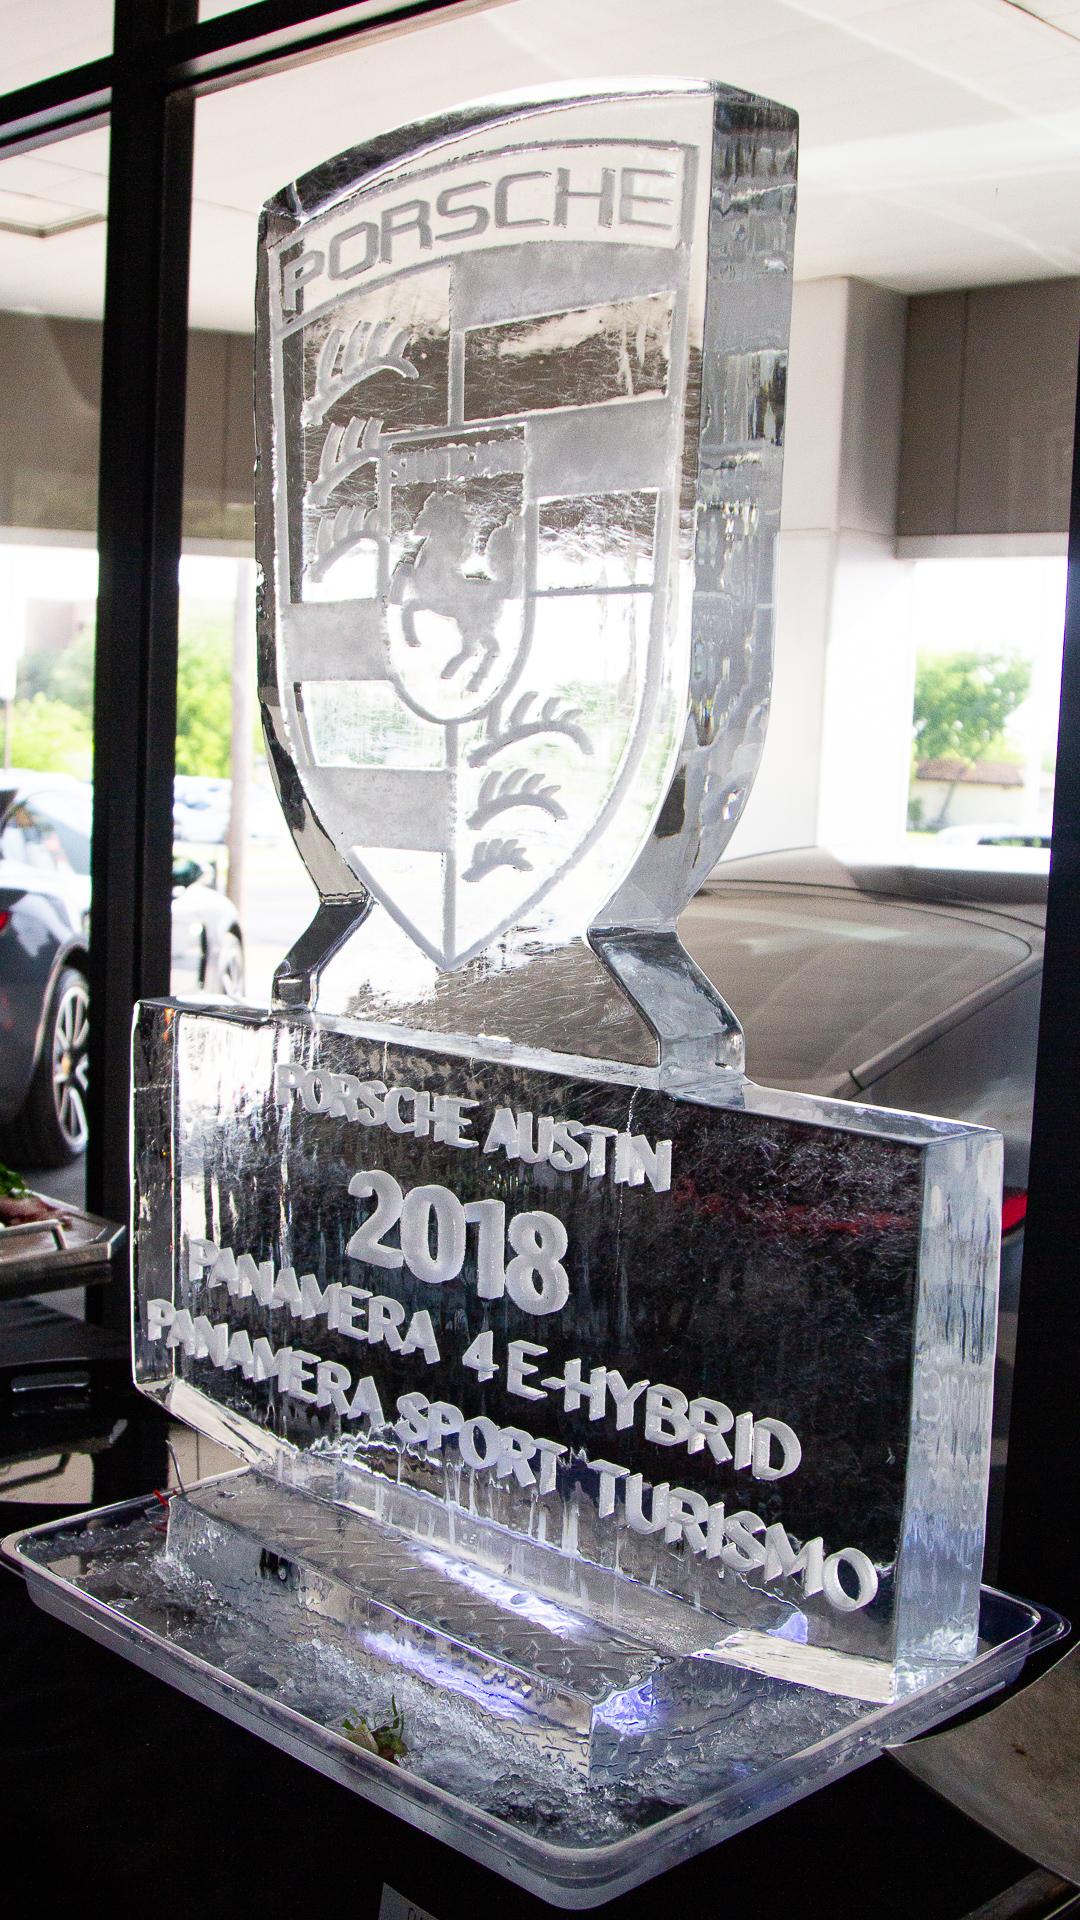 Porsche-Austin-2018-Panamera-12.jpg